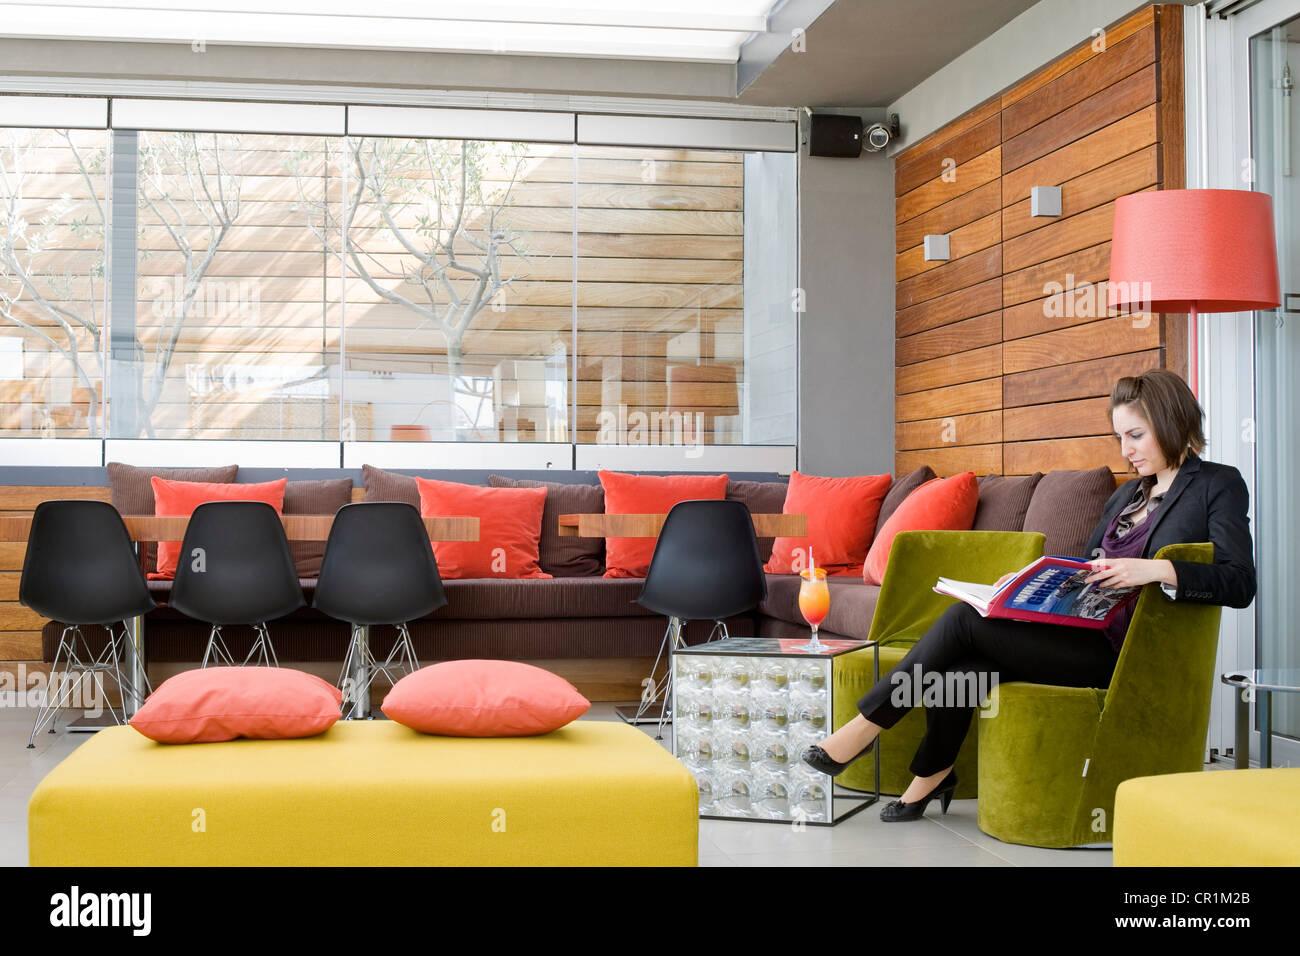 Greece, Attica, Athens, Fresh Hotel, Air Lounge Bar - Stock Image